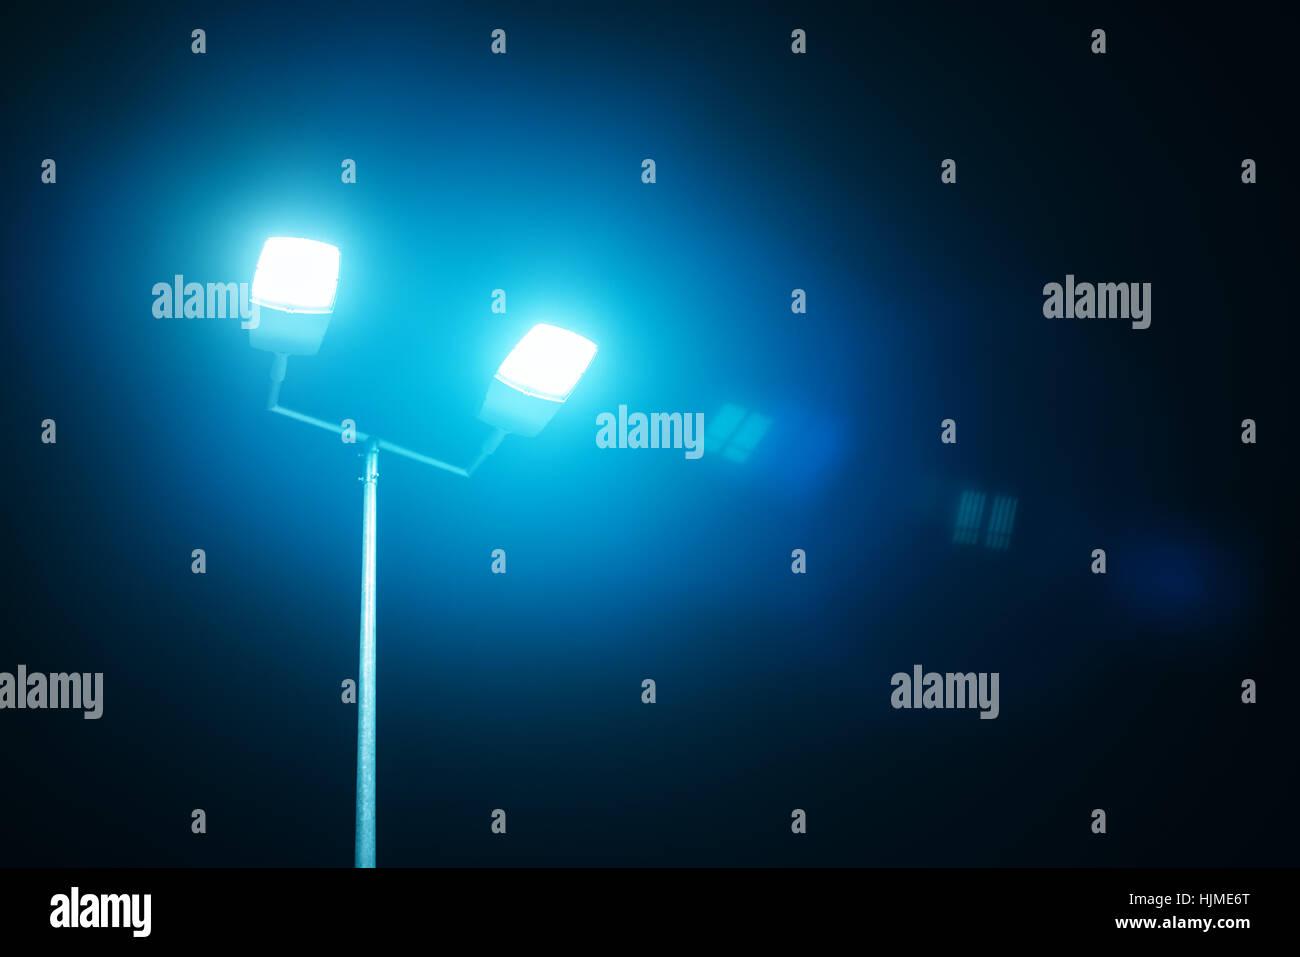 Outdoor sport court or stadium lights against dark night sky stock outdoor sport court or stadium lights against dark night sky aloadofball Gallery